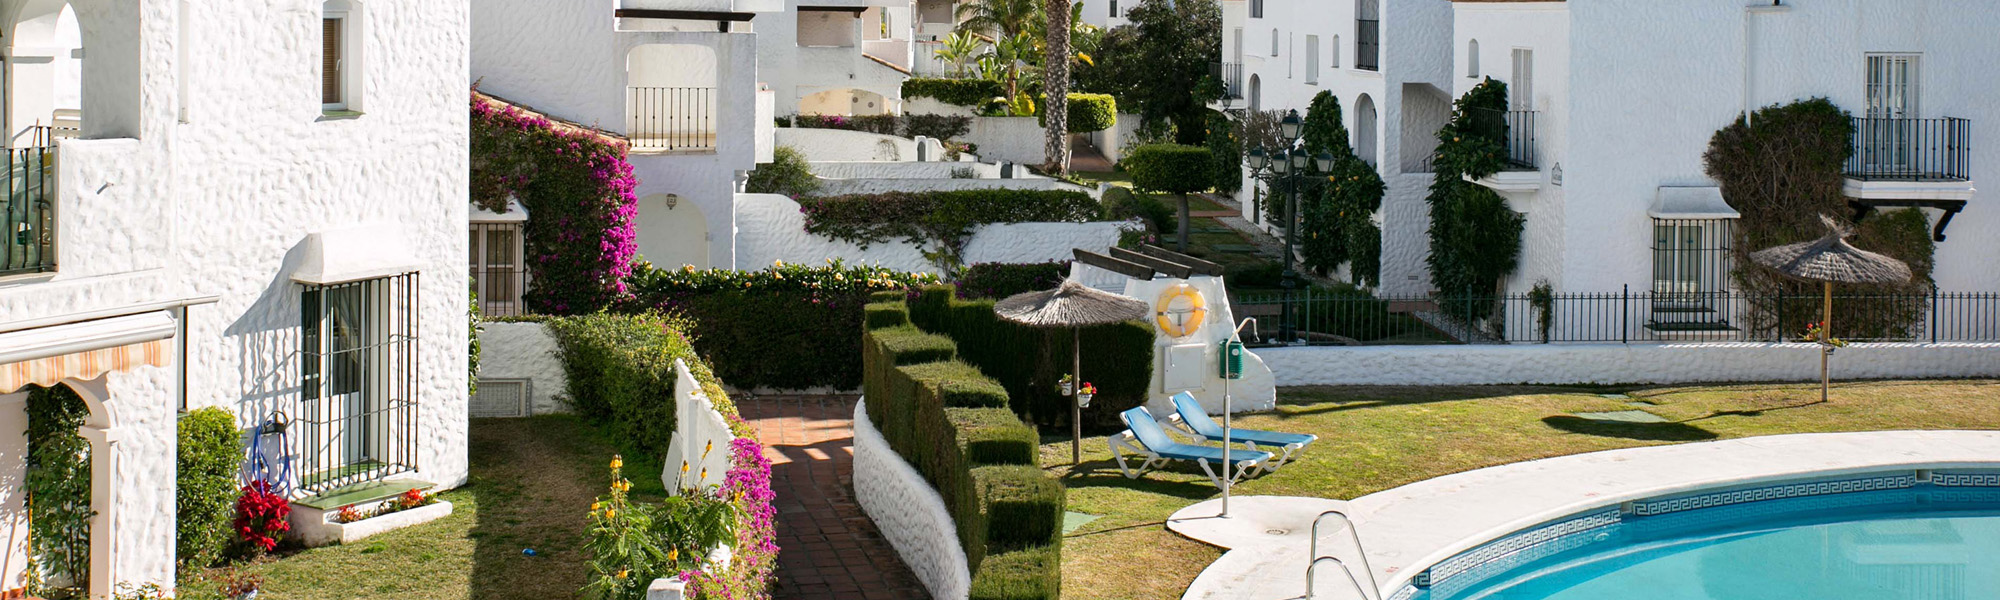 Ona Club Benavista Apartments